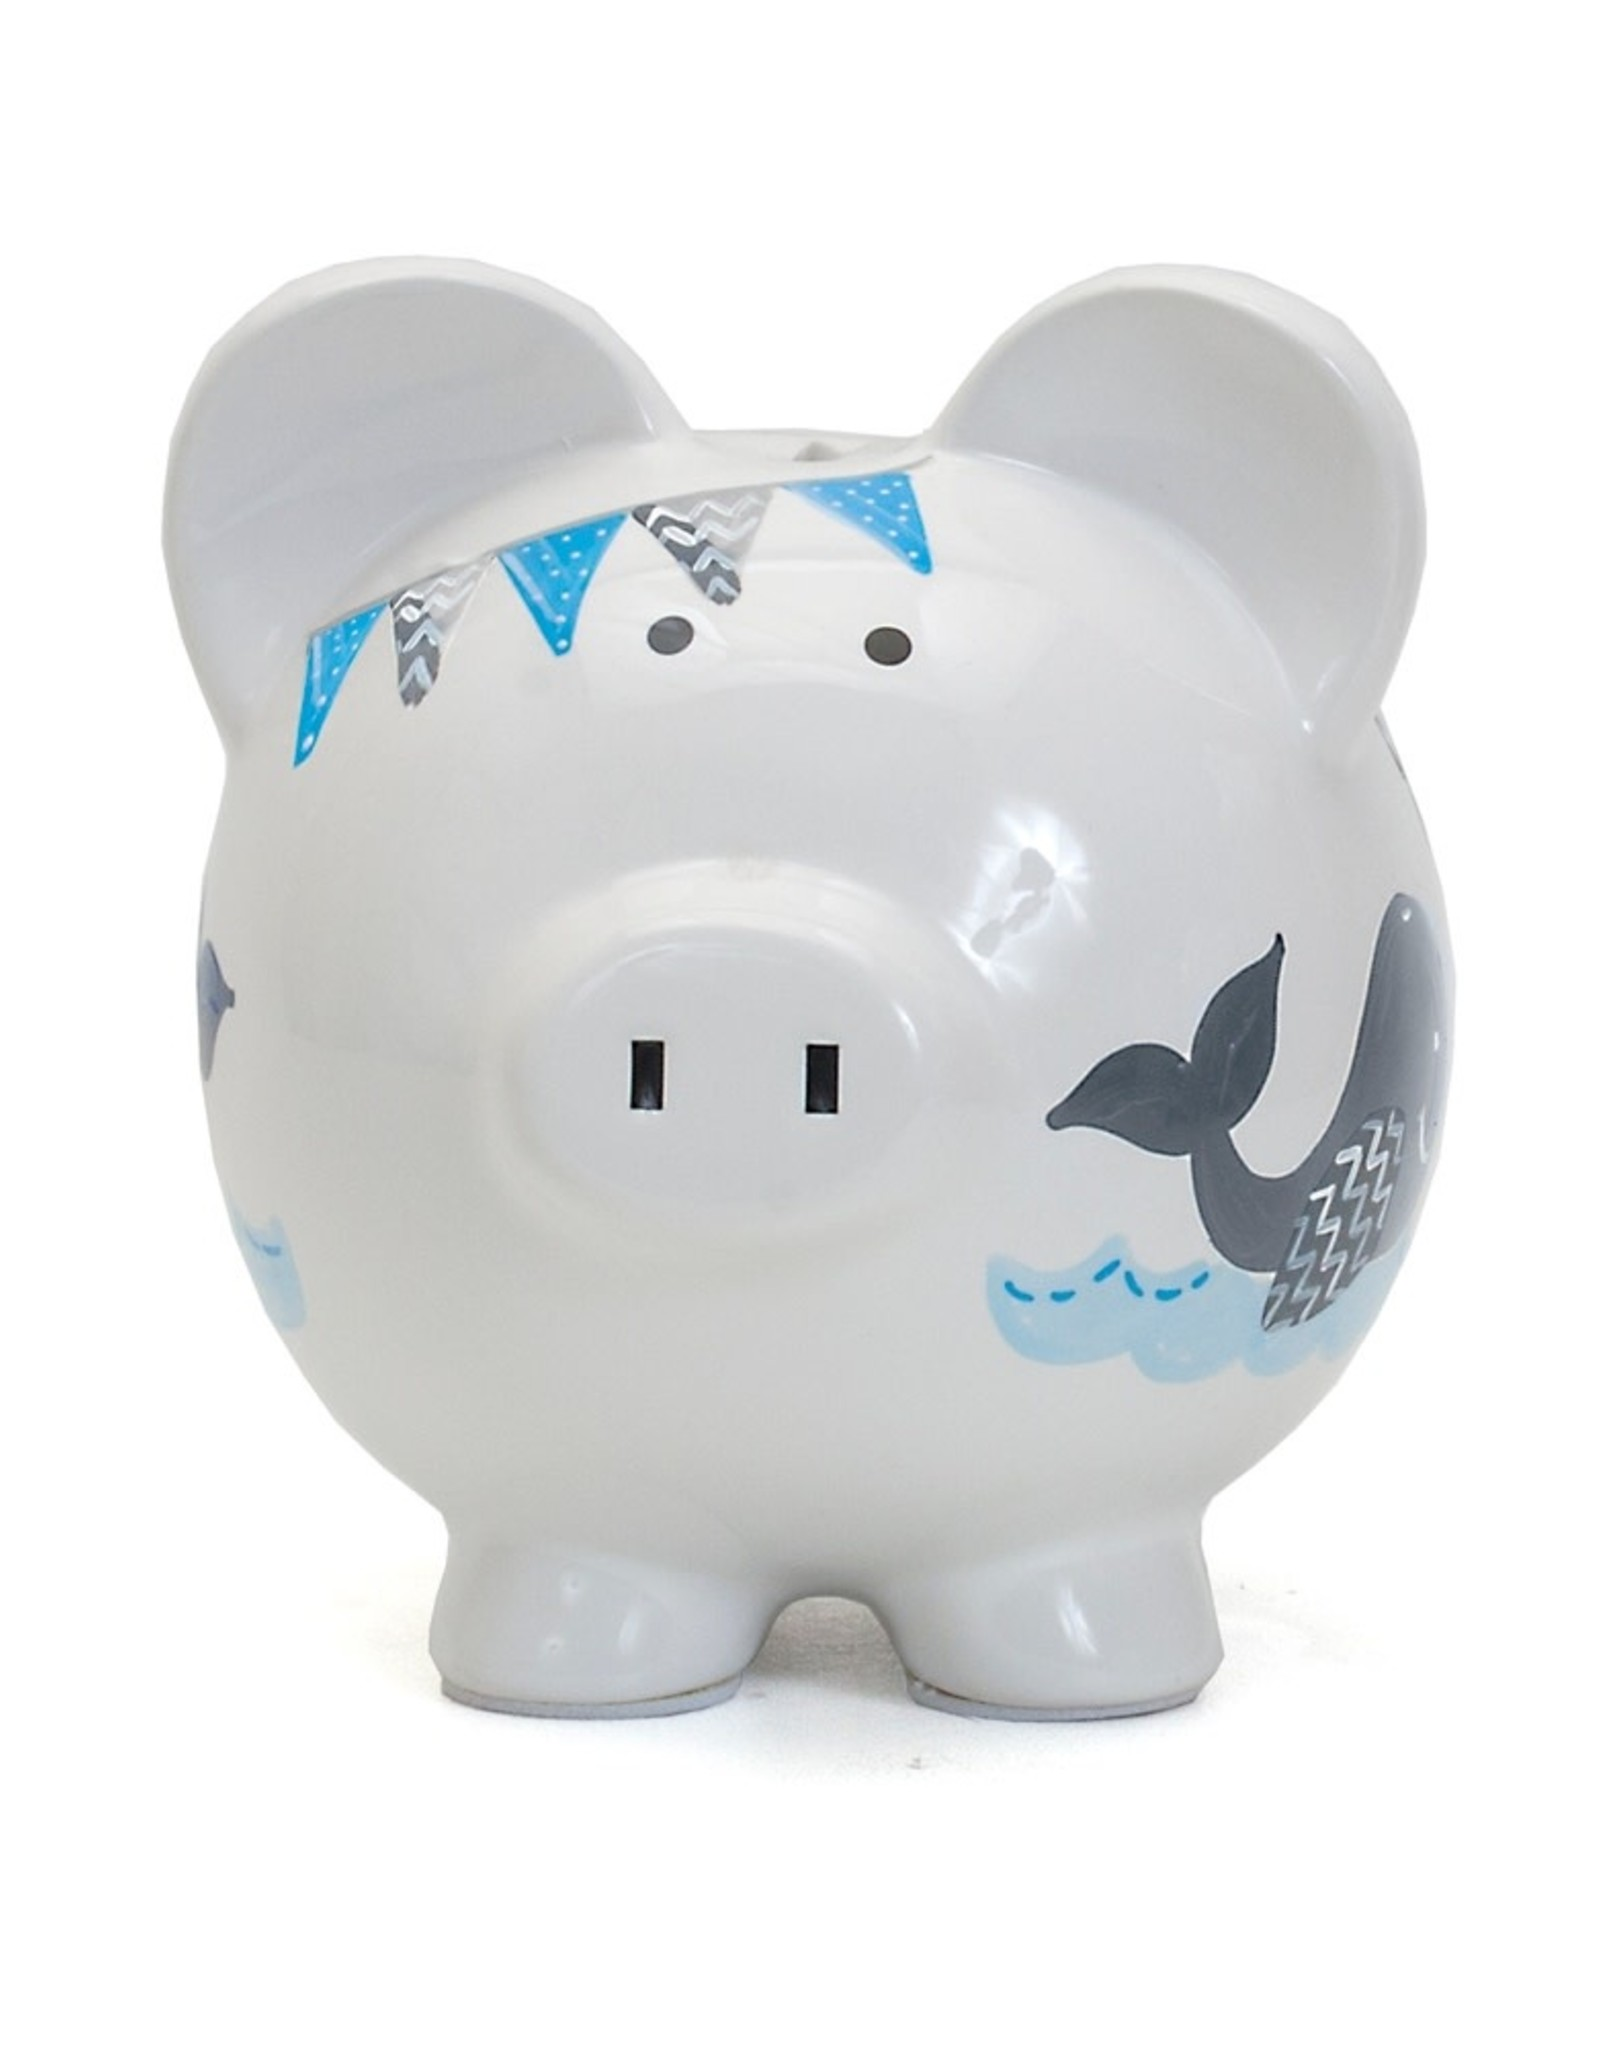 Child to Cherish Blue Whale Pig Bank